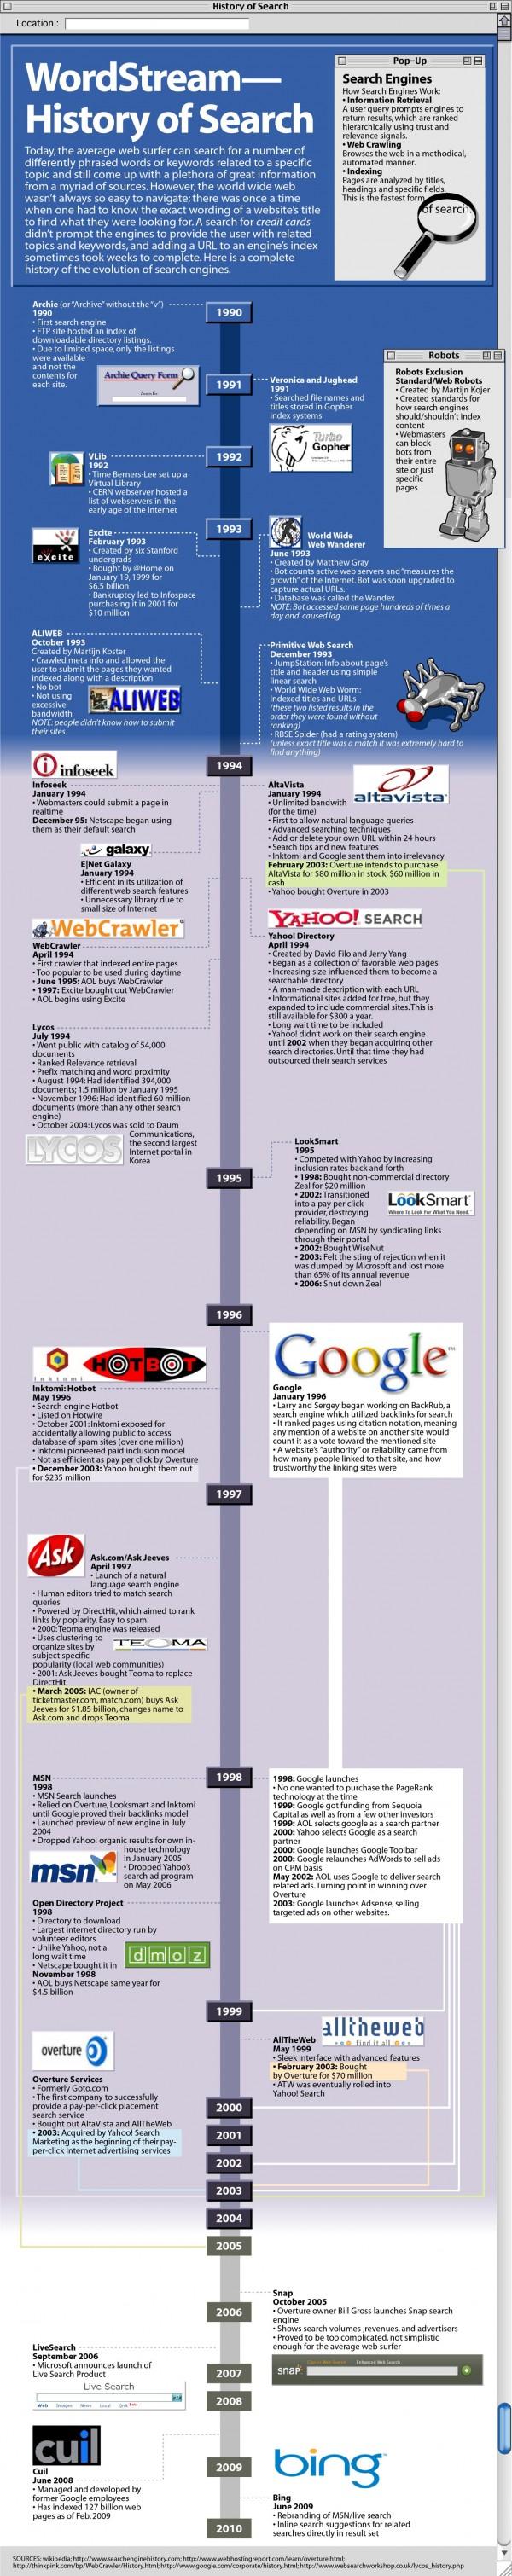 infographic-on-social-media-26